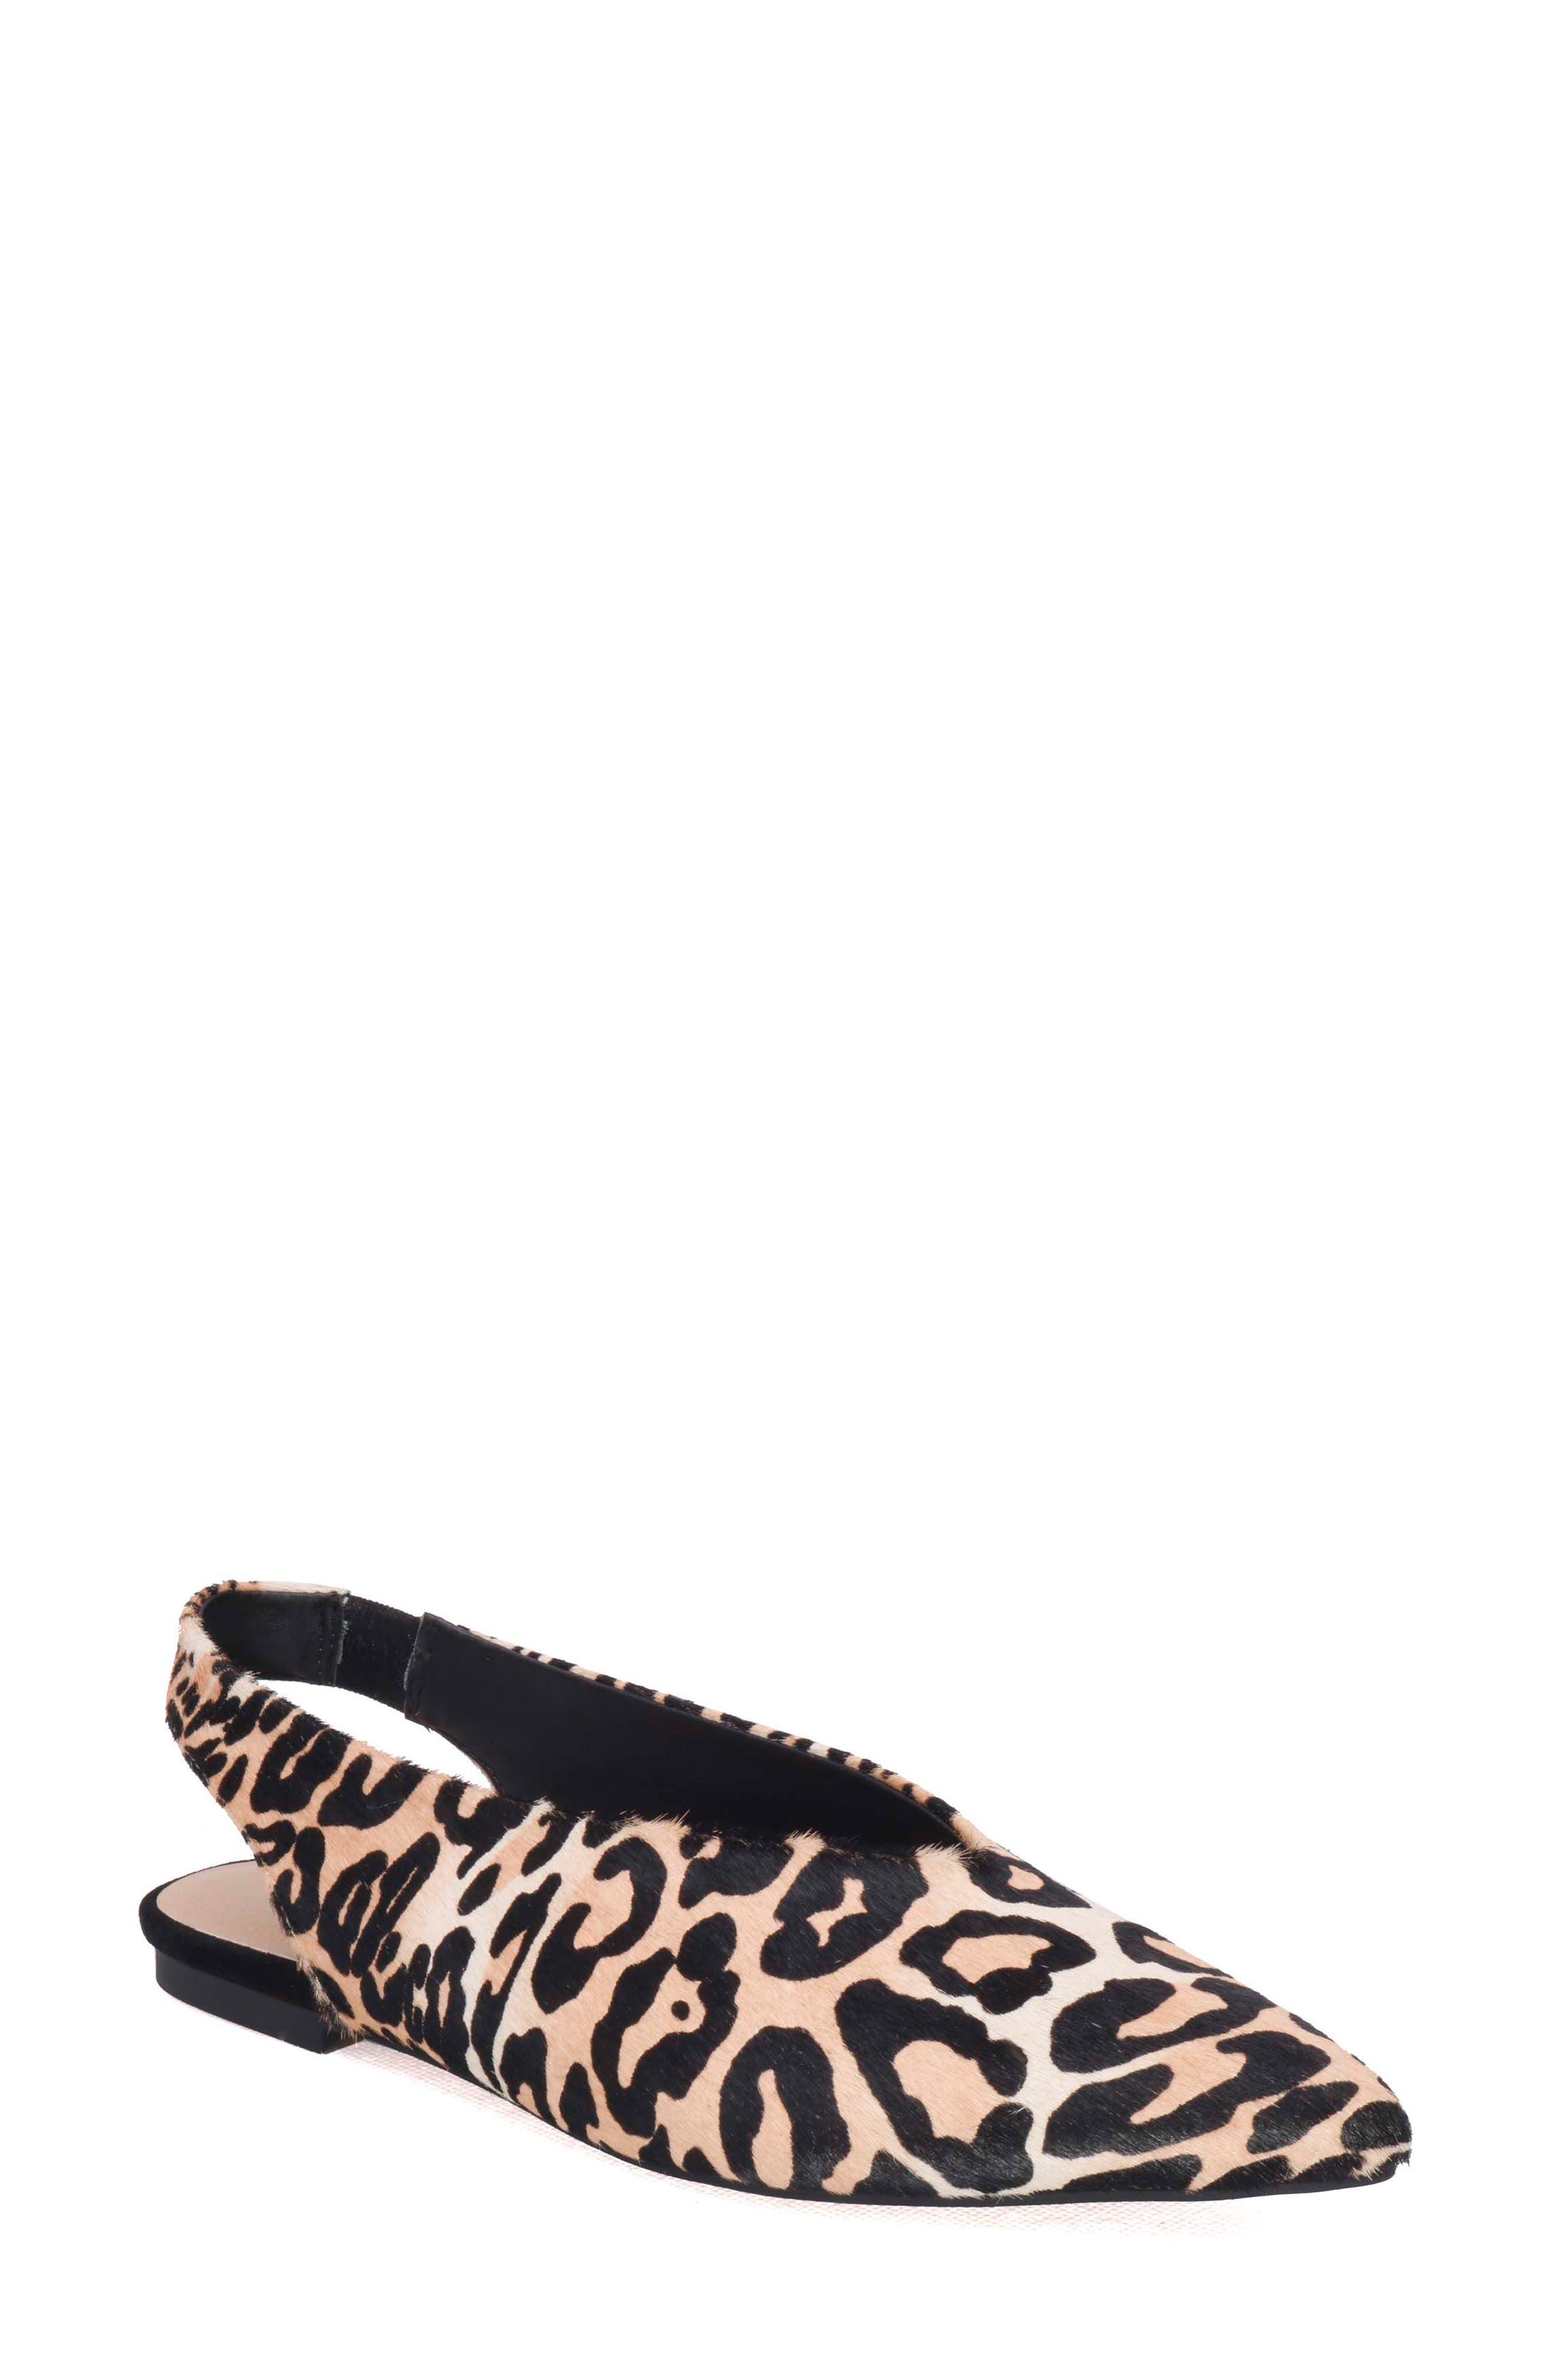 Violet Genuine Calf Hair Slingback Flat,                             Main thumbnail 1, color,                             Leopard Calf Hair